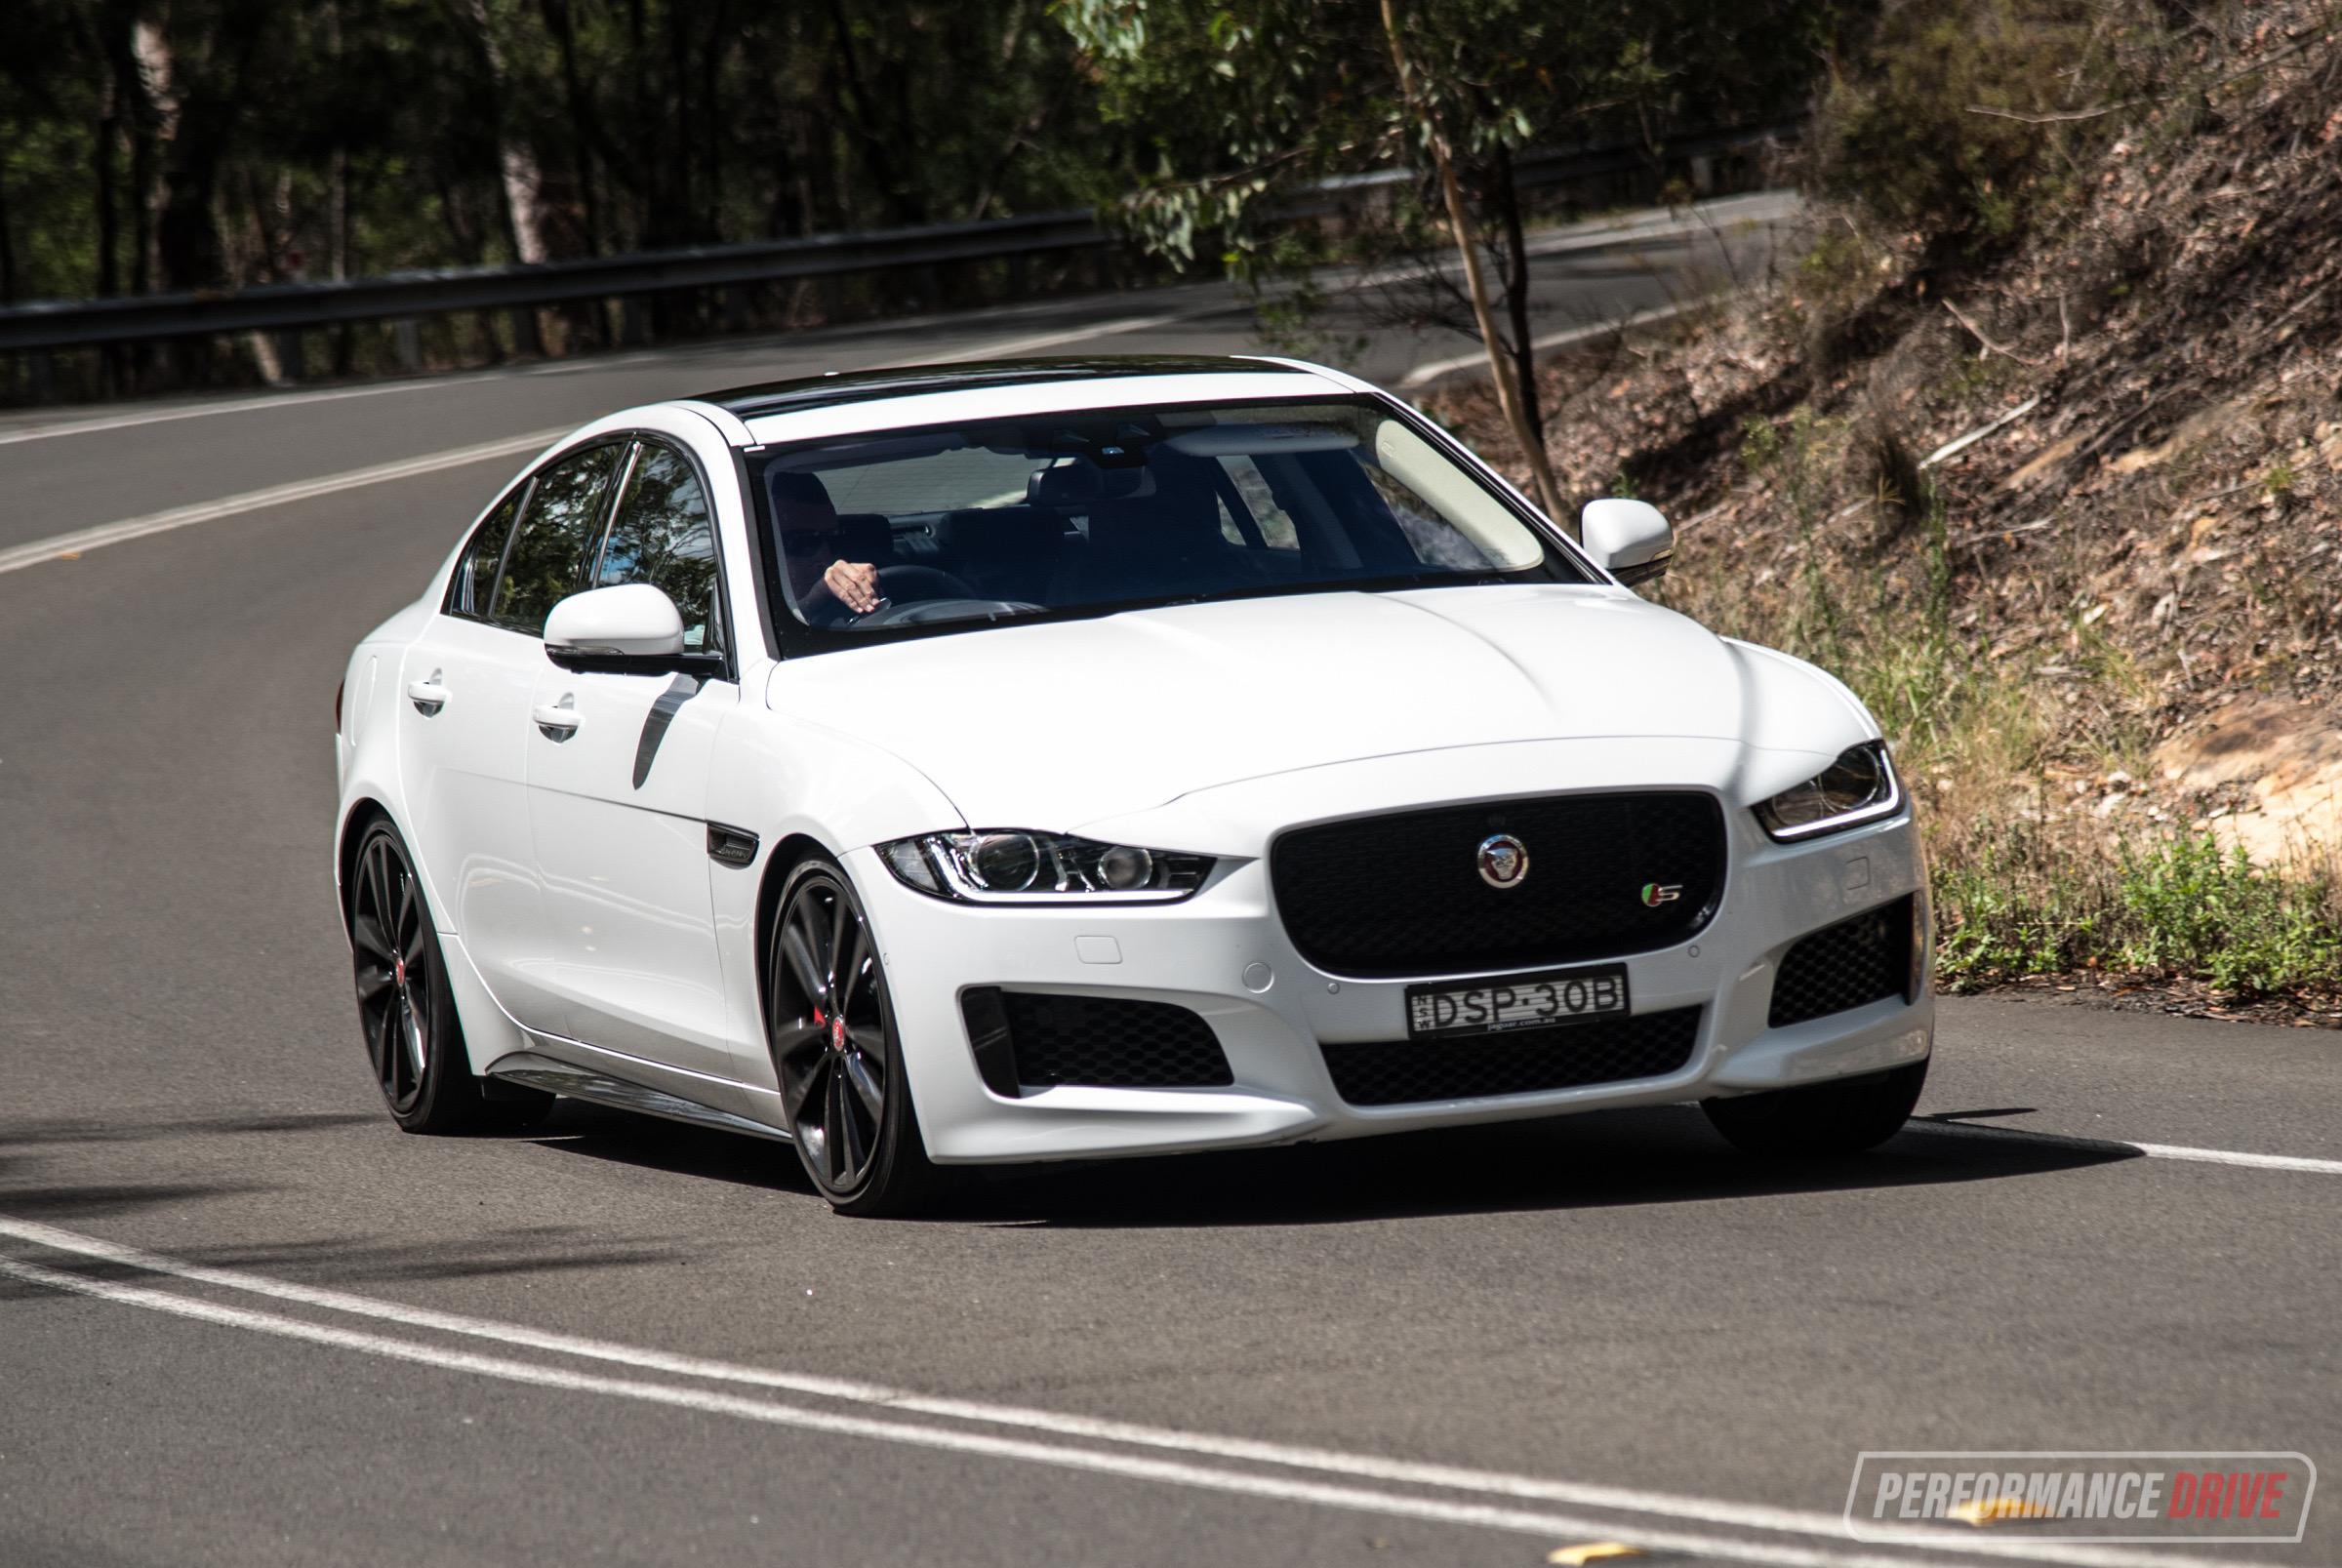 2018 jaguar xe s review (video) | performancedrive